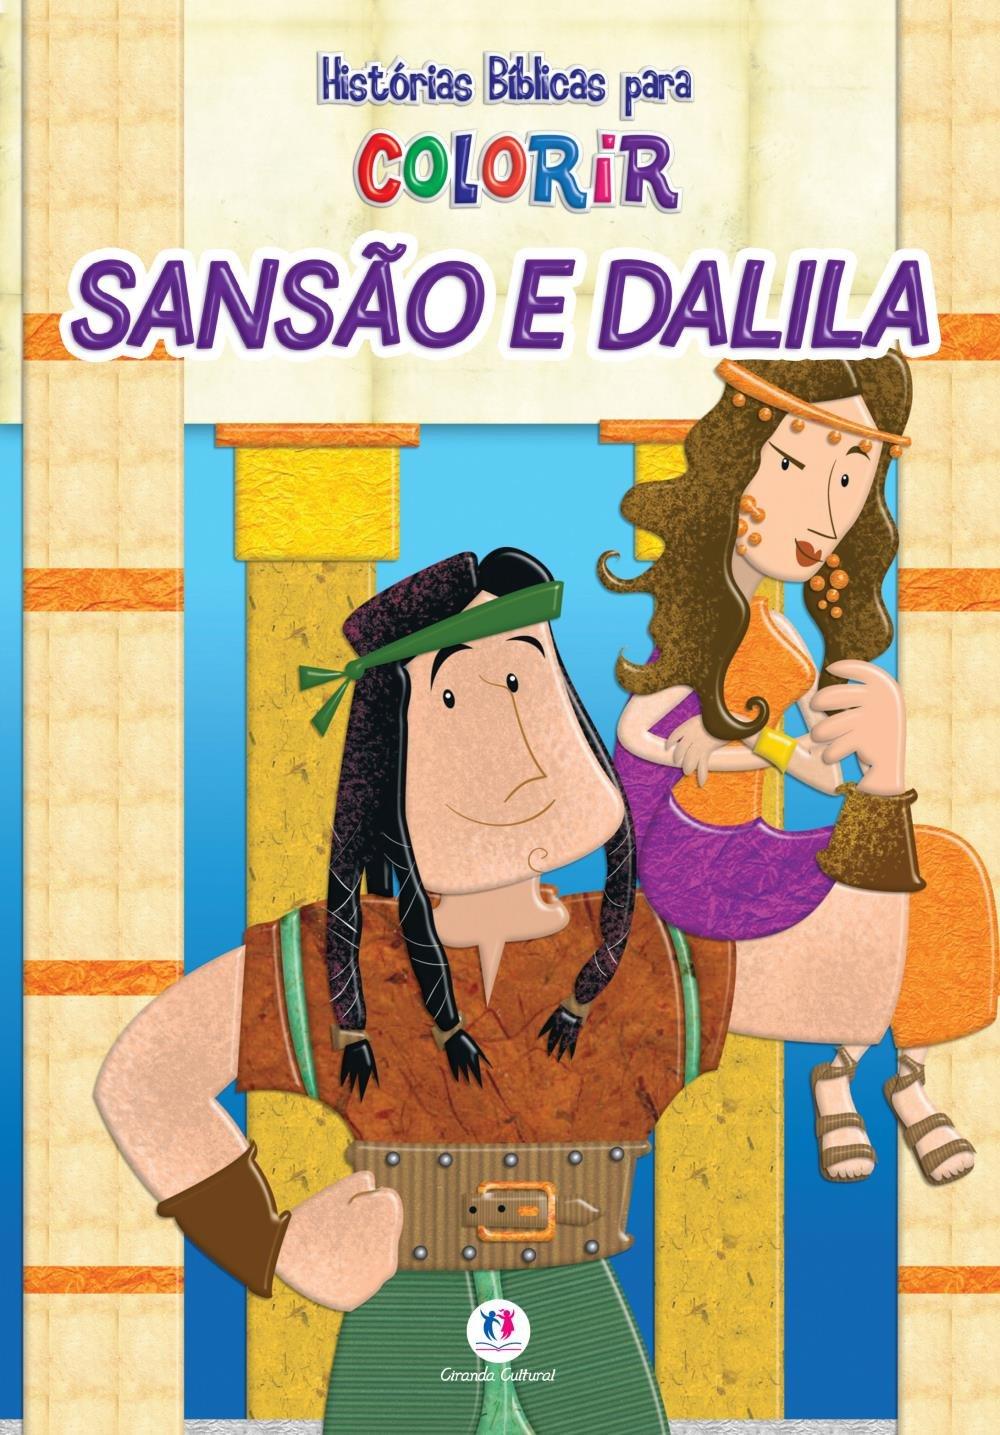 Historias Da Biblia Para Colorir Sansao E Dalila Saraiva